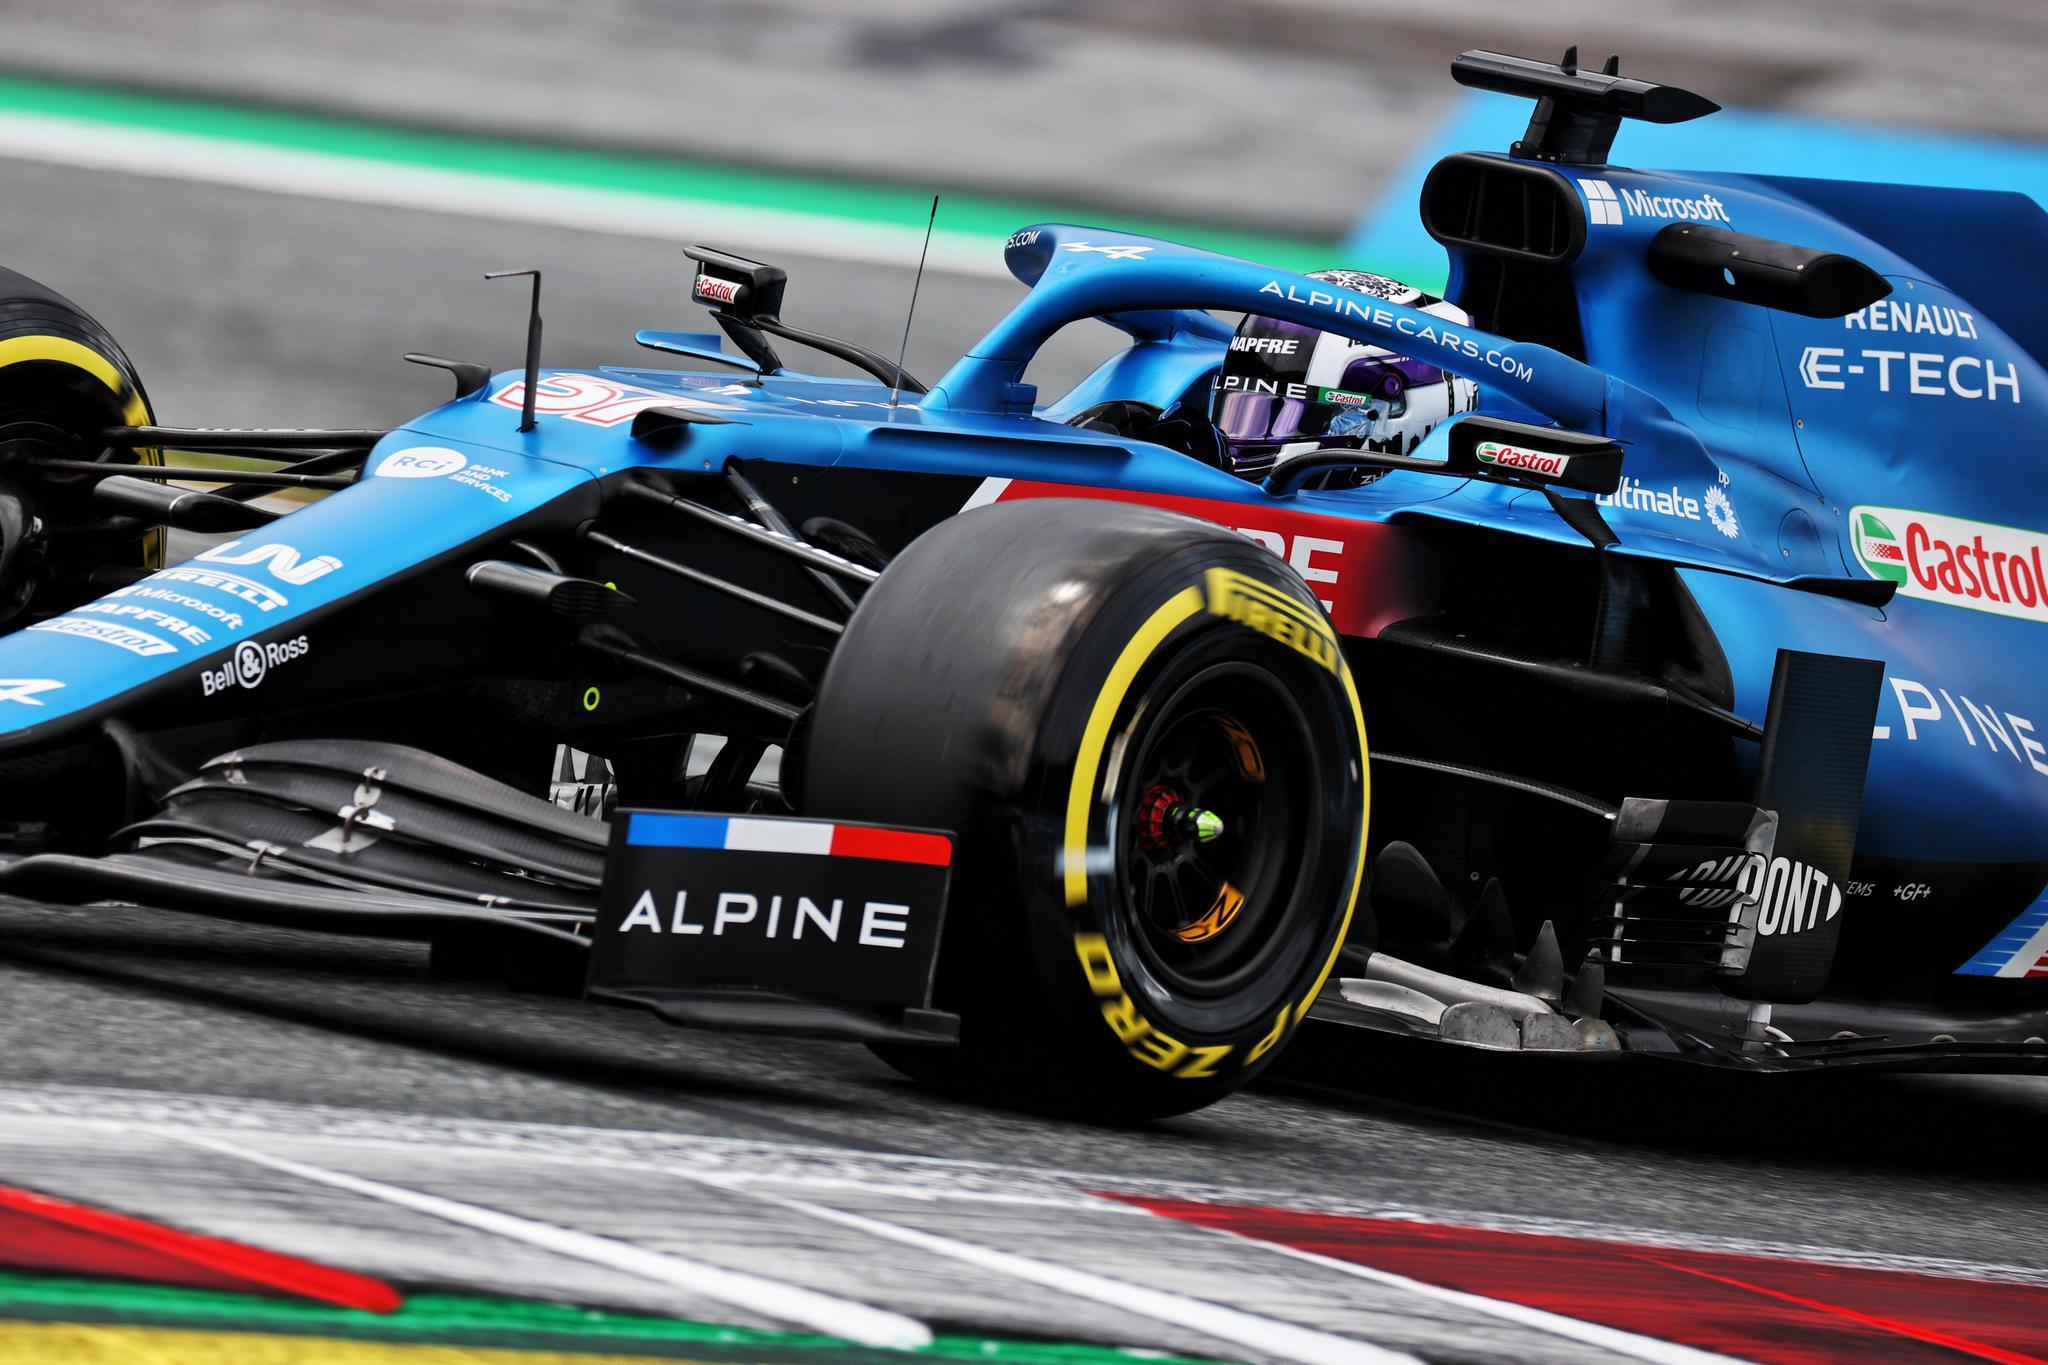 F1明年有望迎来中国车手 周冠宇接近签约